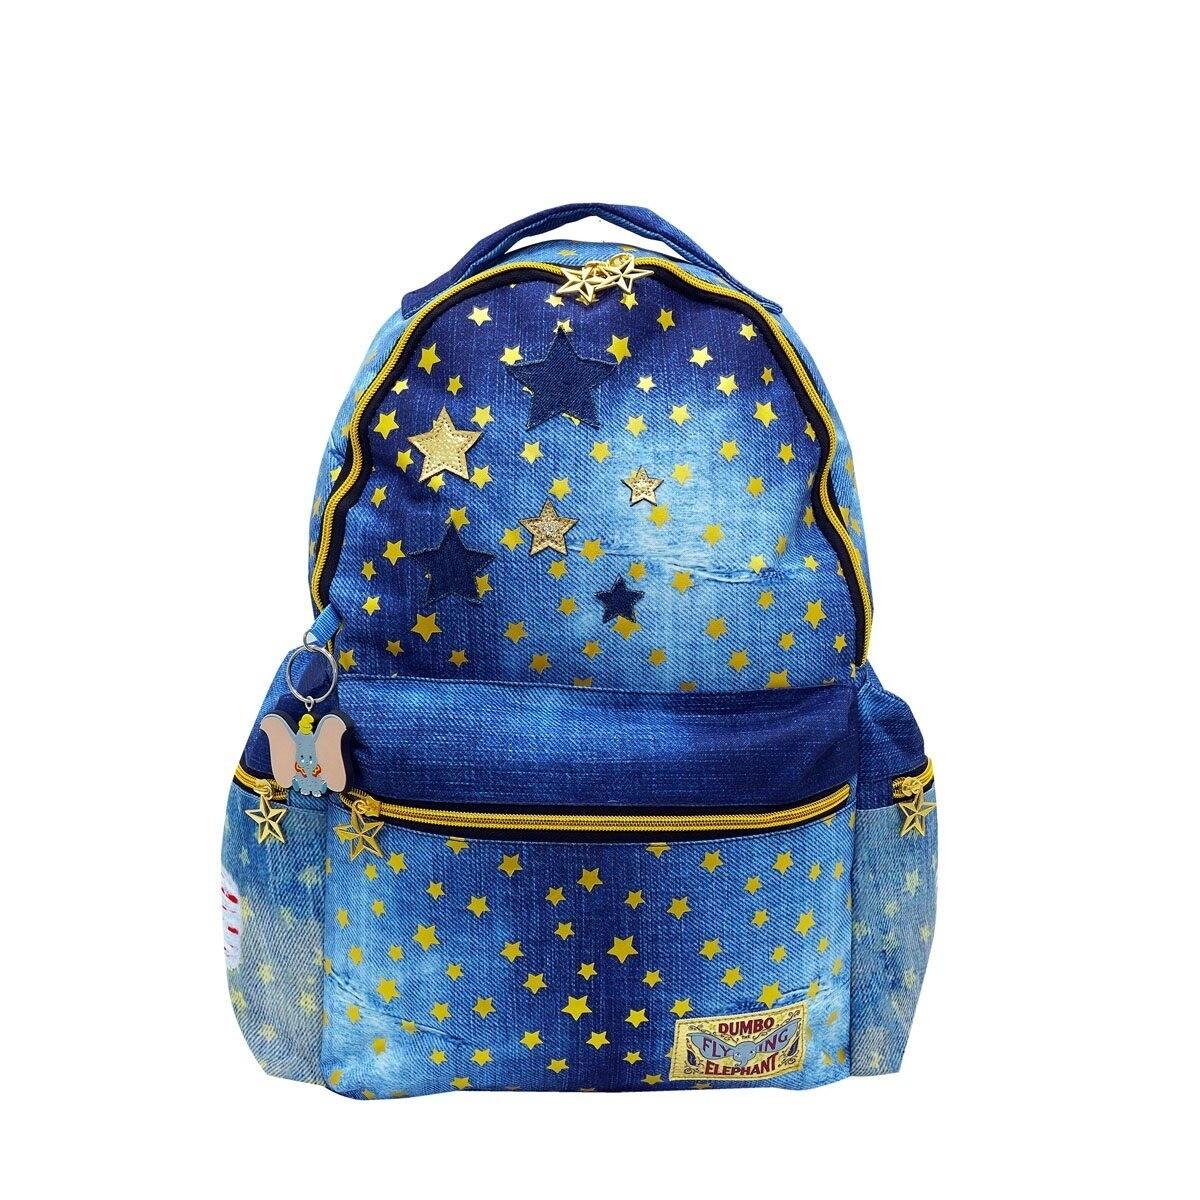 Bolsa Mochila Dumbo Azul Estrellas